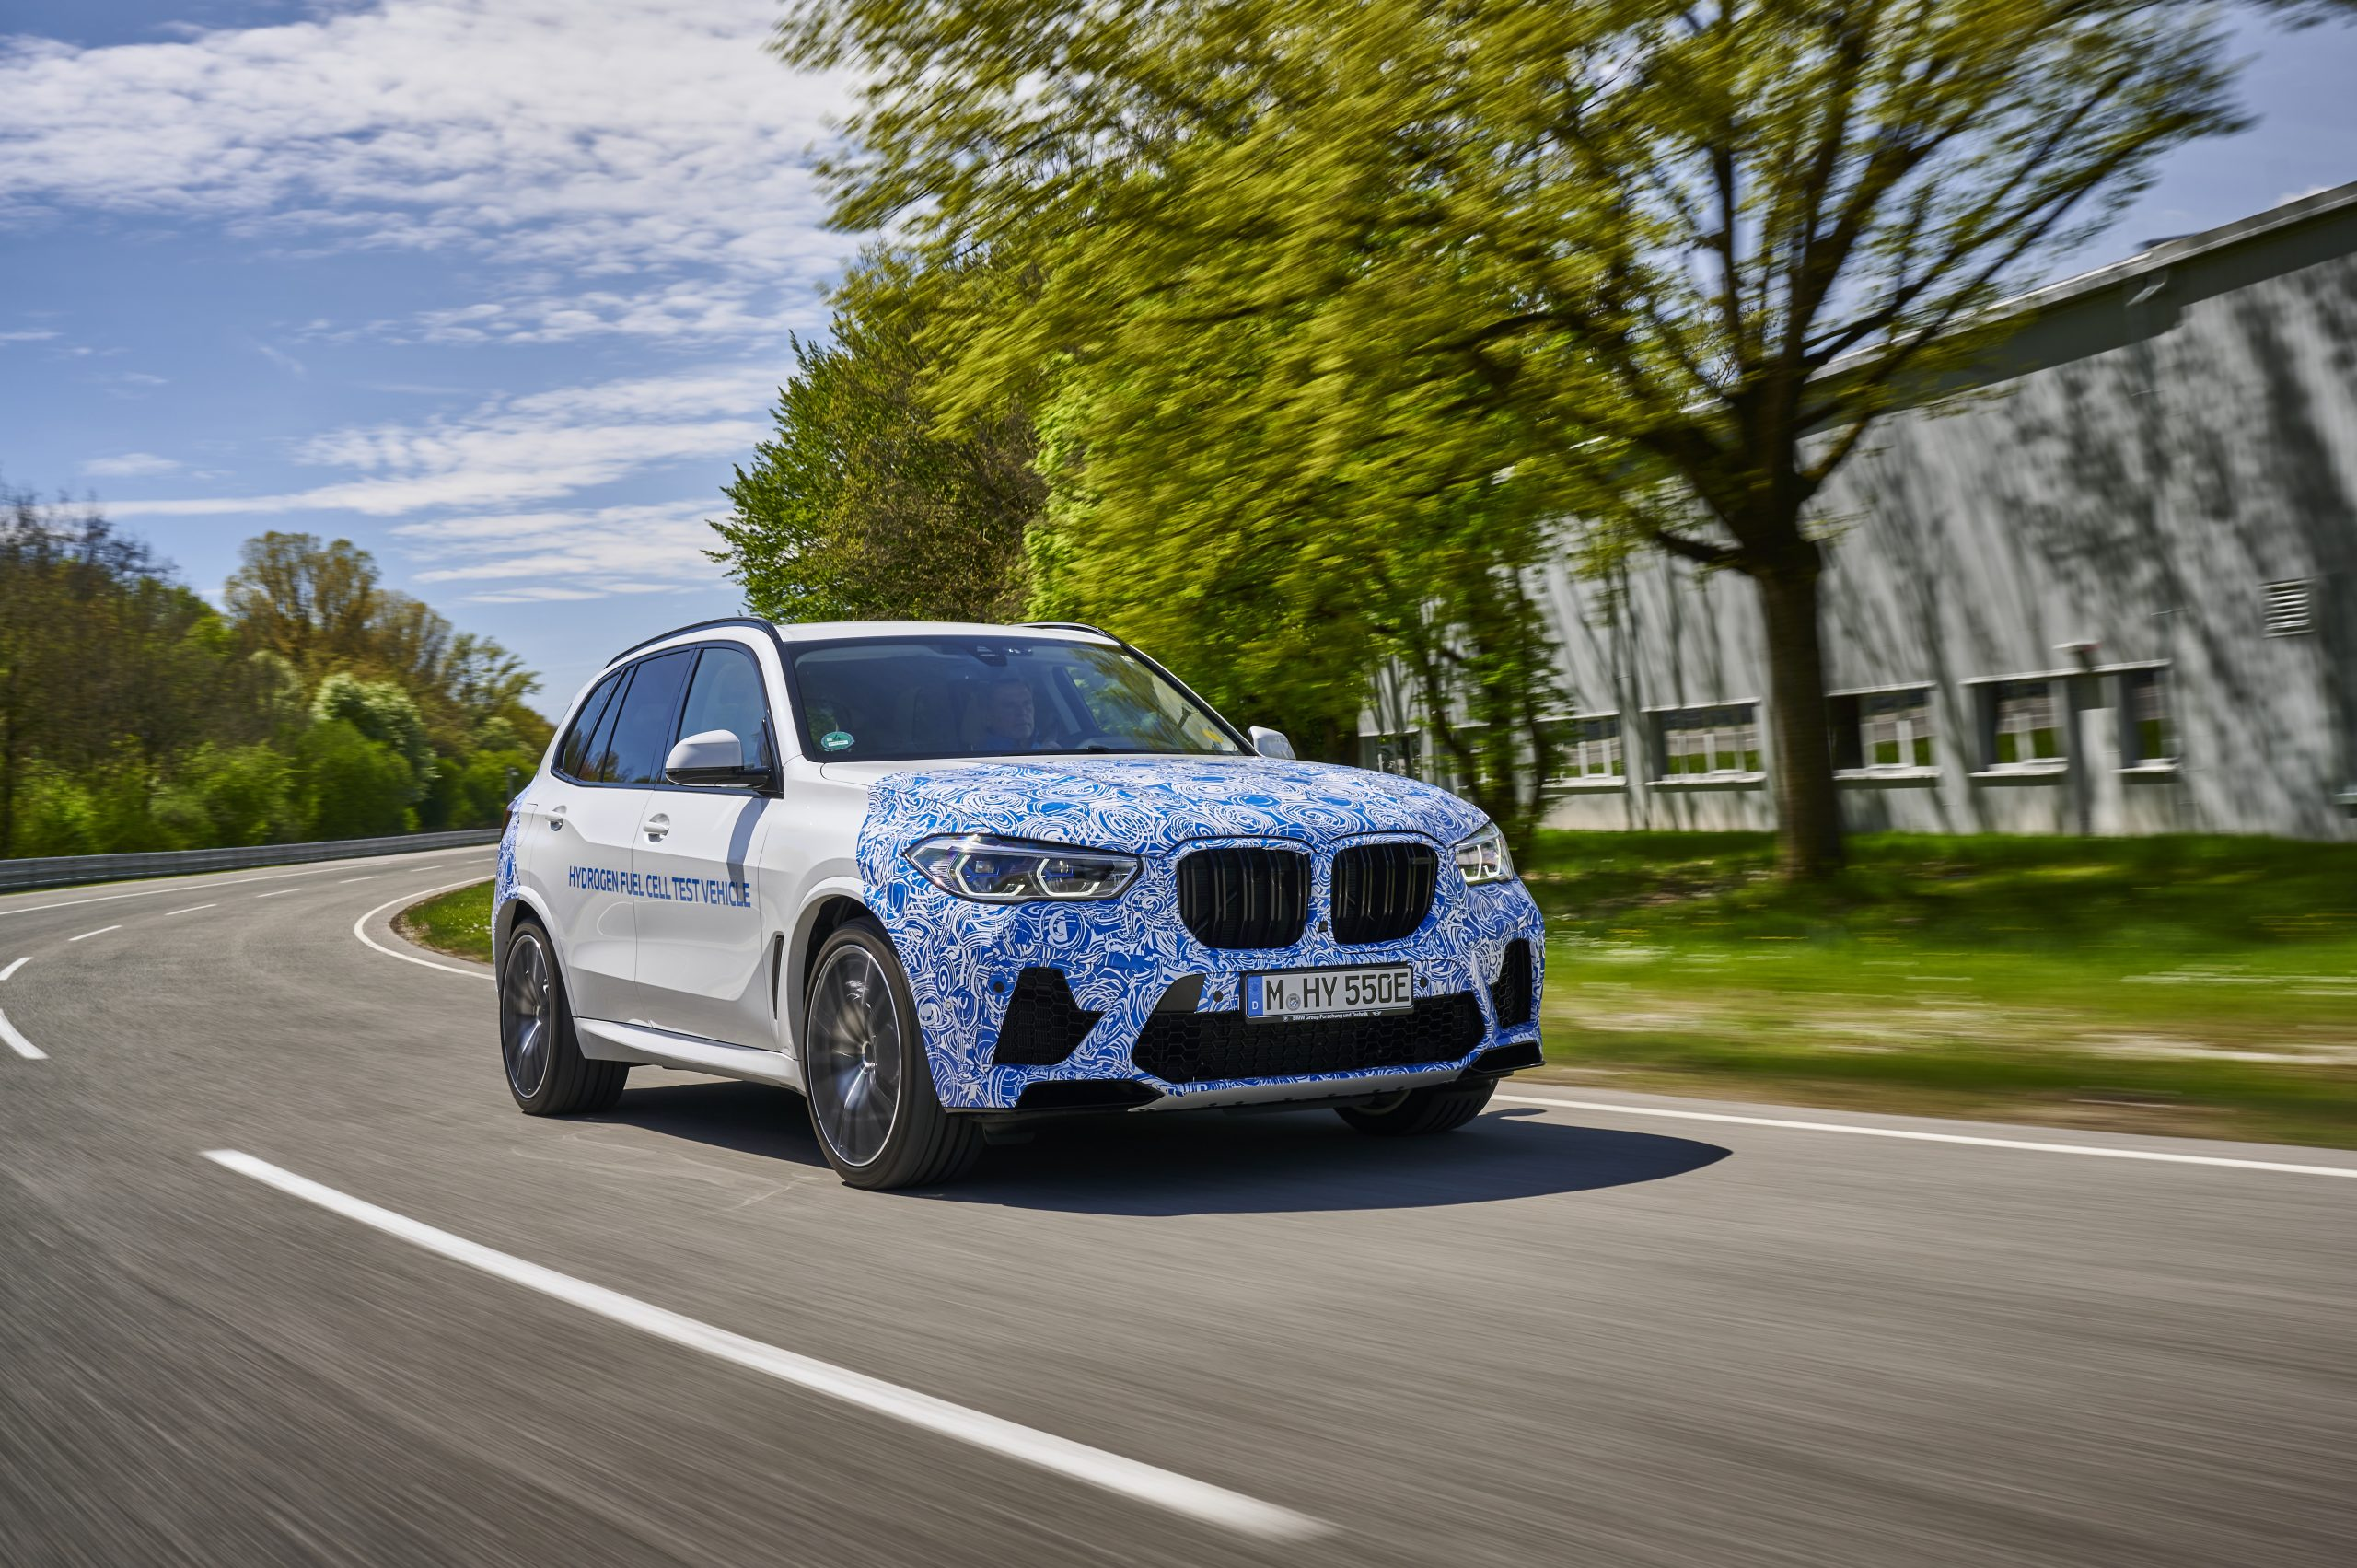 P90424559 highRes scaled Η BMW ξεκινά δοκιμές για μοντέλα κυψελών καυσίμου υδρογόνου BMW, zblog, ειδήσεις, Νέα, υδρογόνο